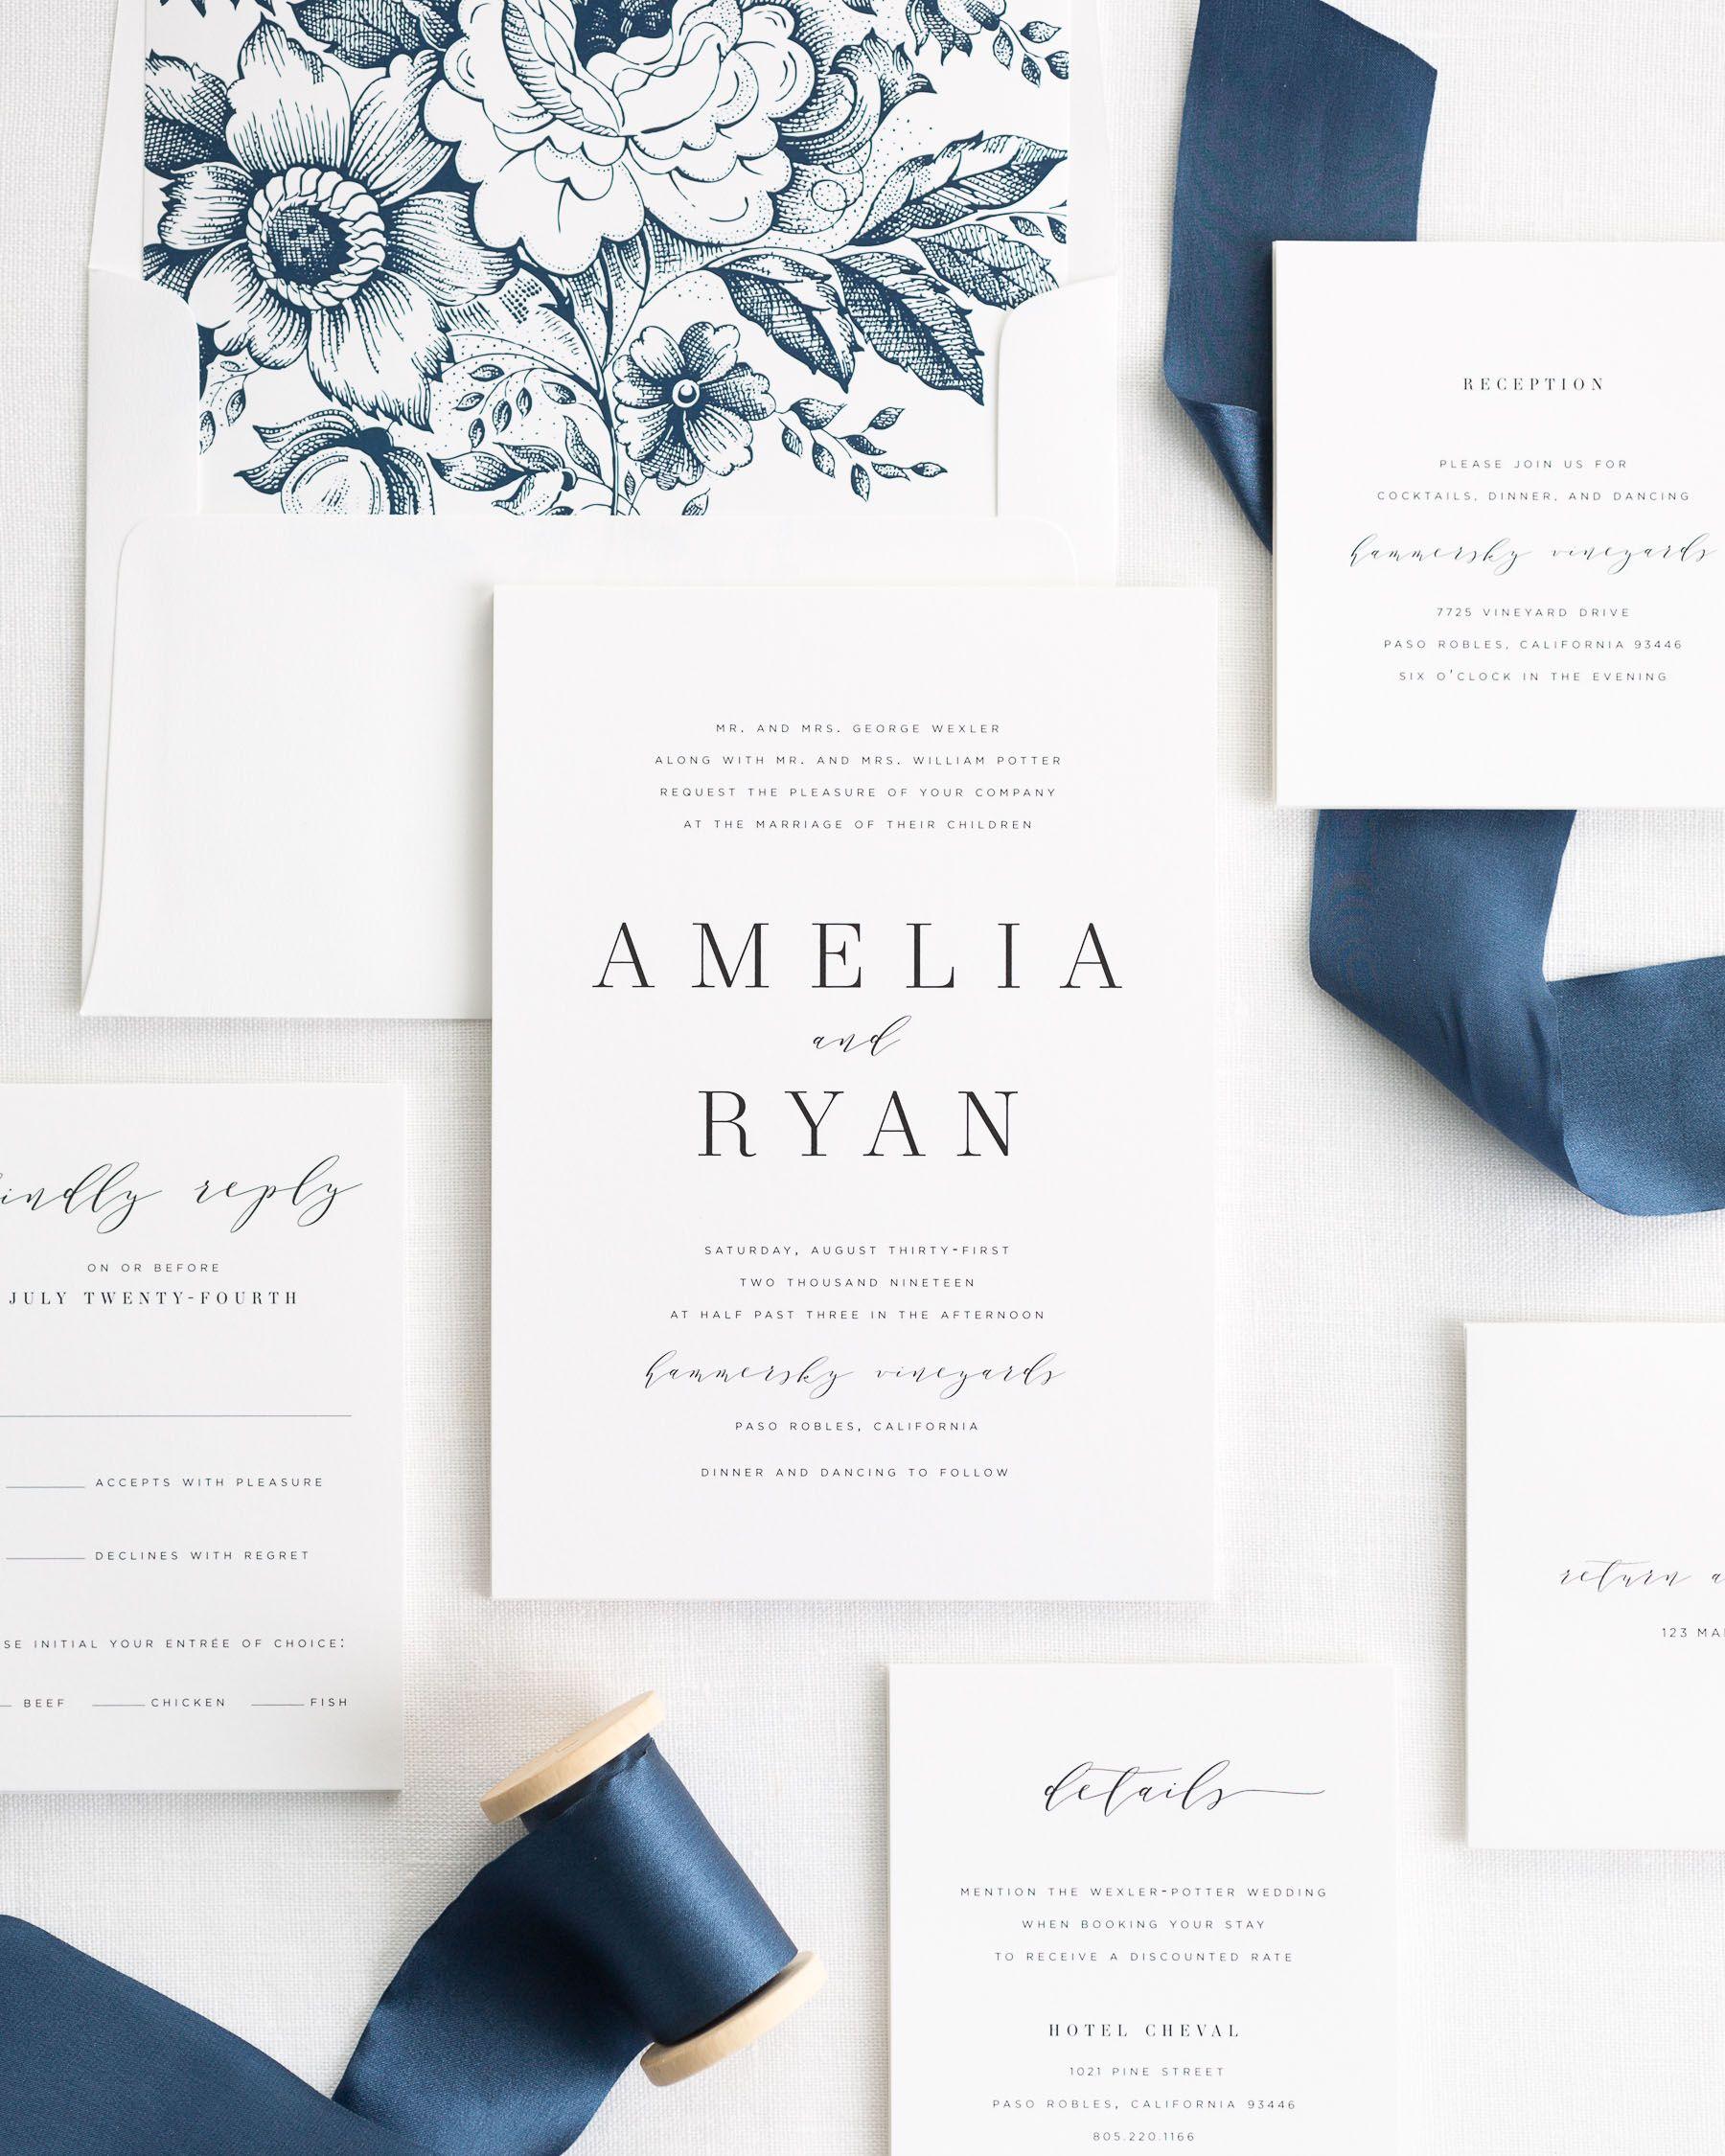 Amelia Ribbon Wedding Invitations | Amelia and Weddings